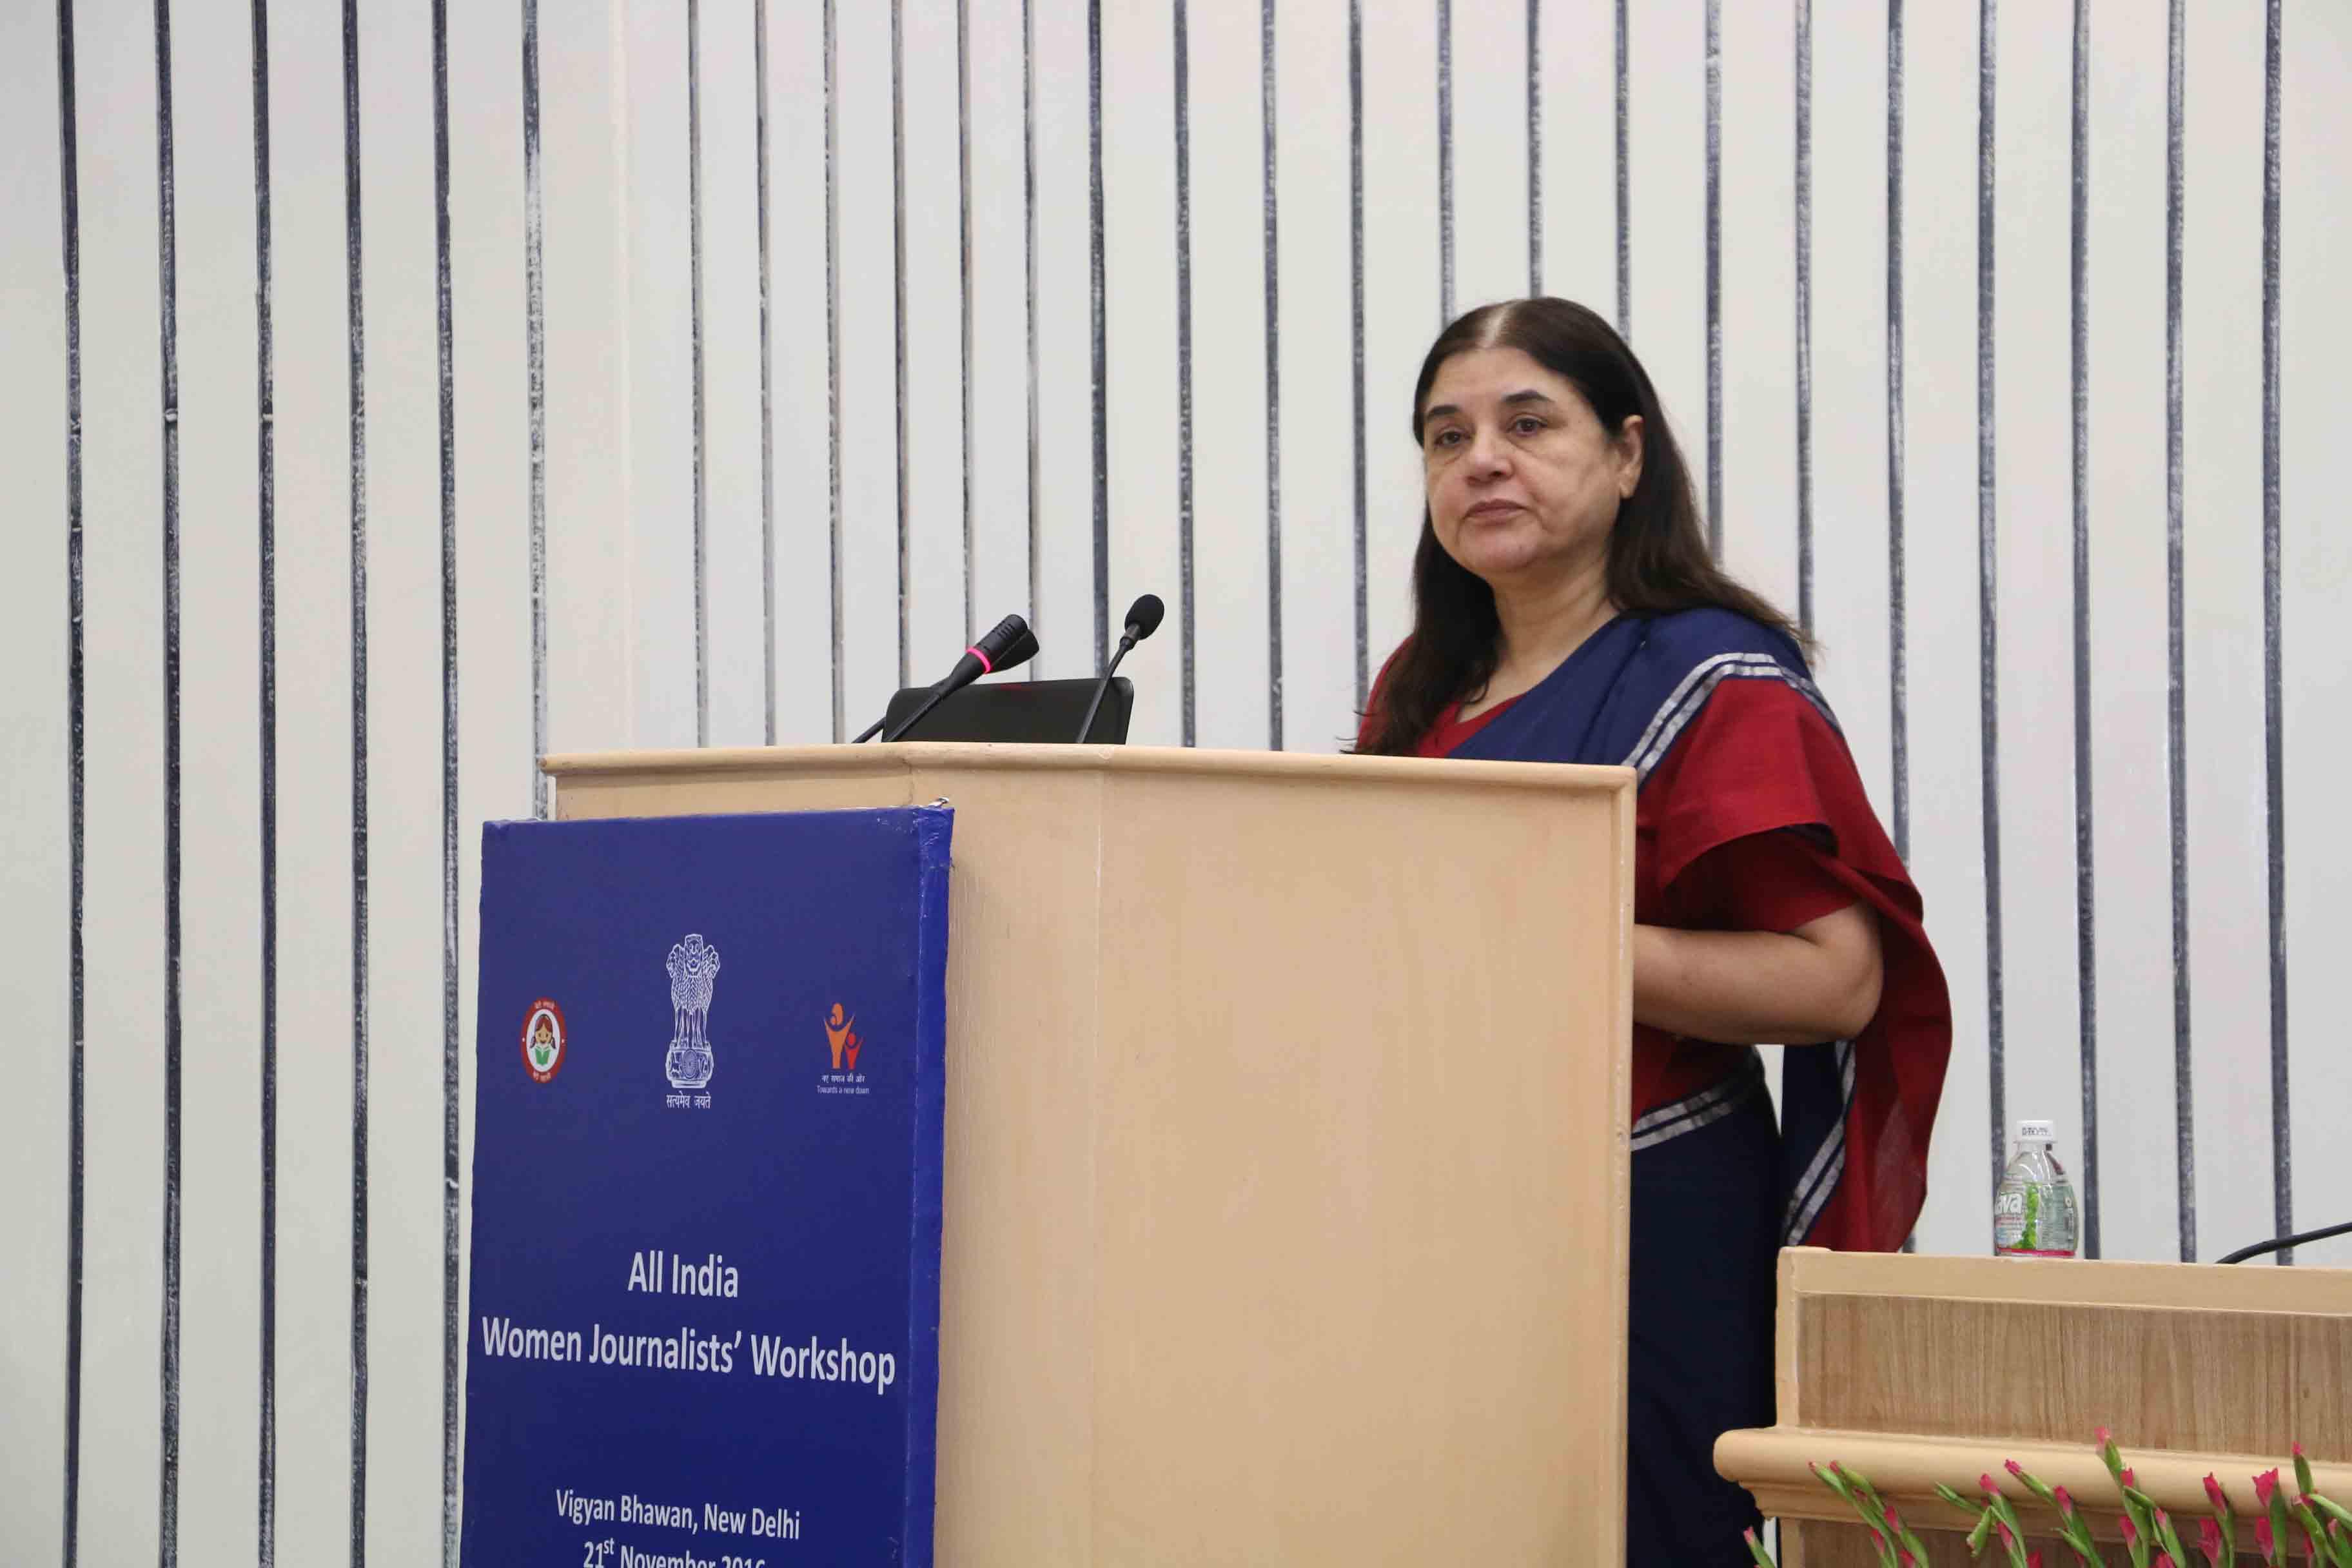 All India Women Journalists Workshop at Vigyan Bhawan 5